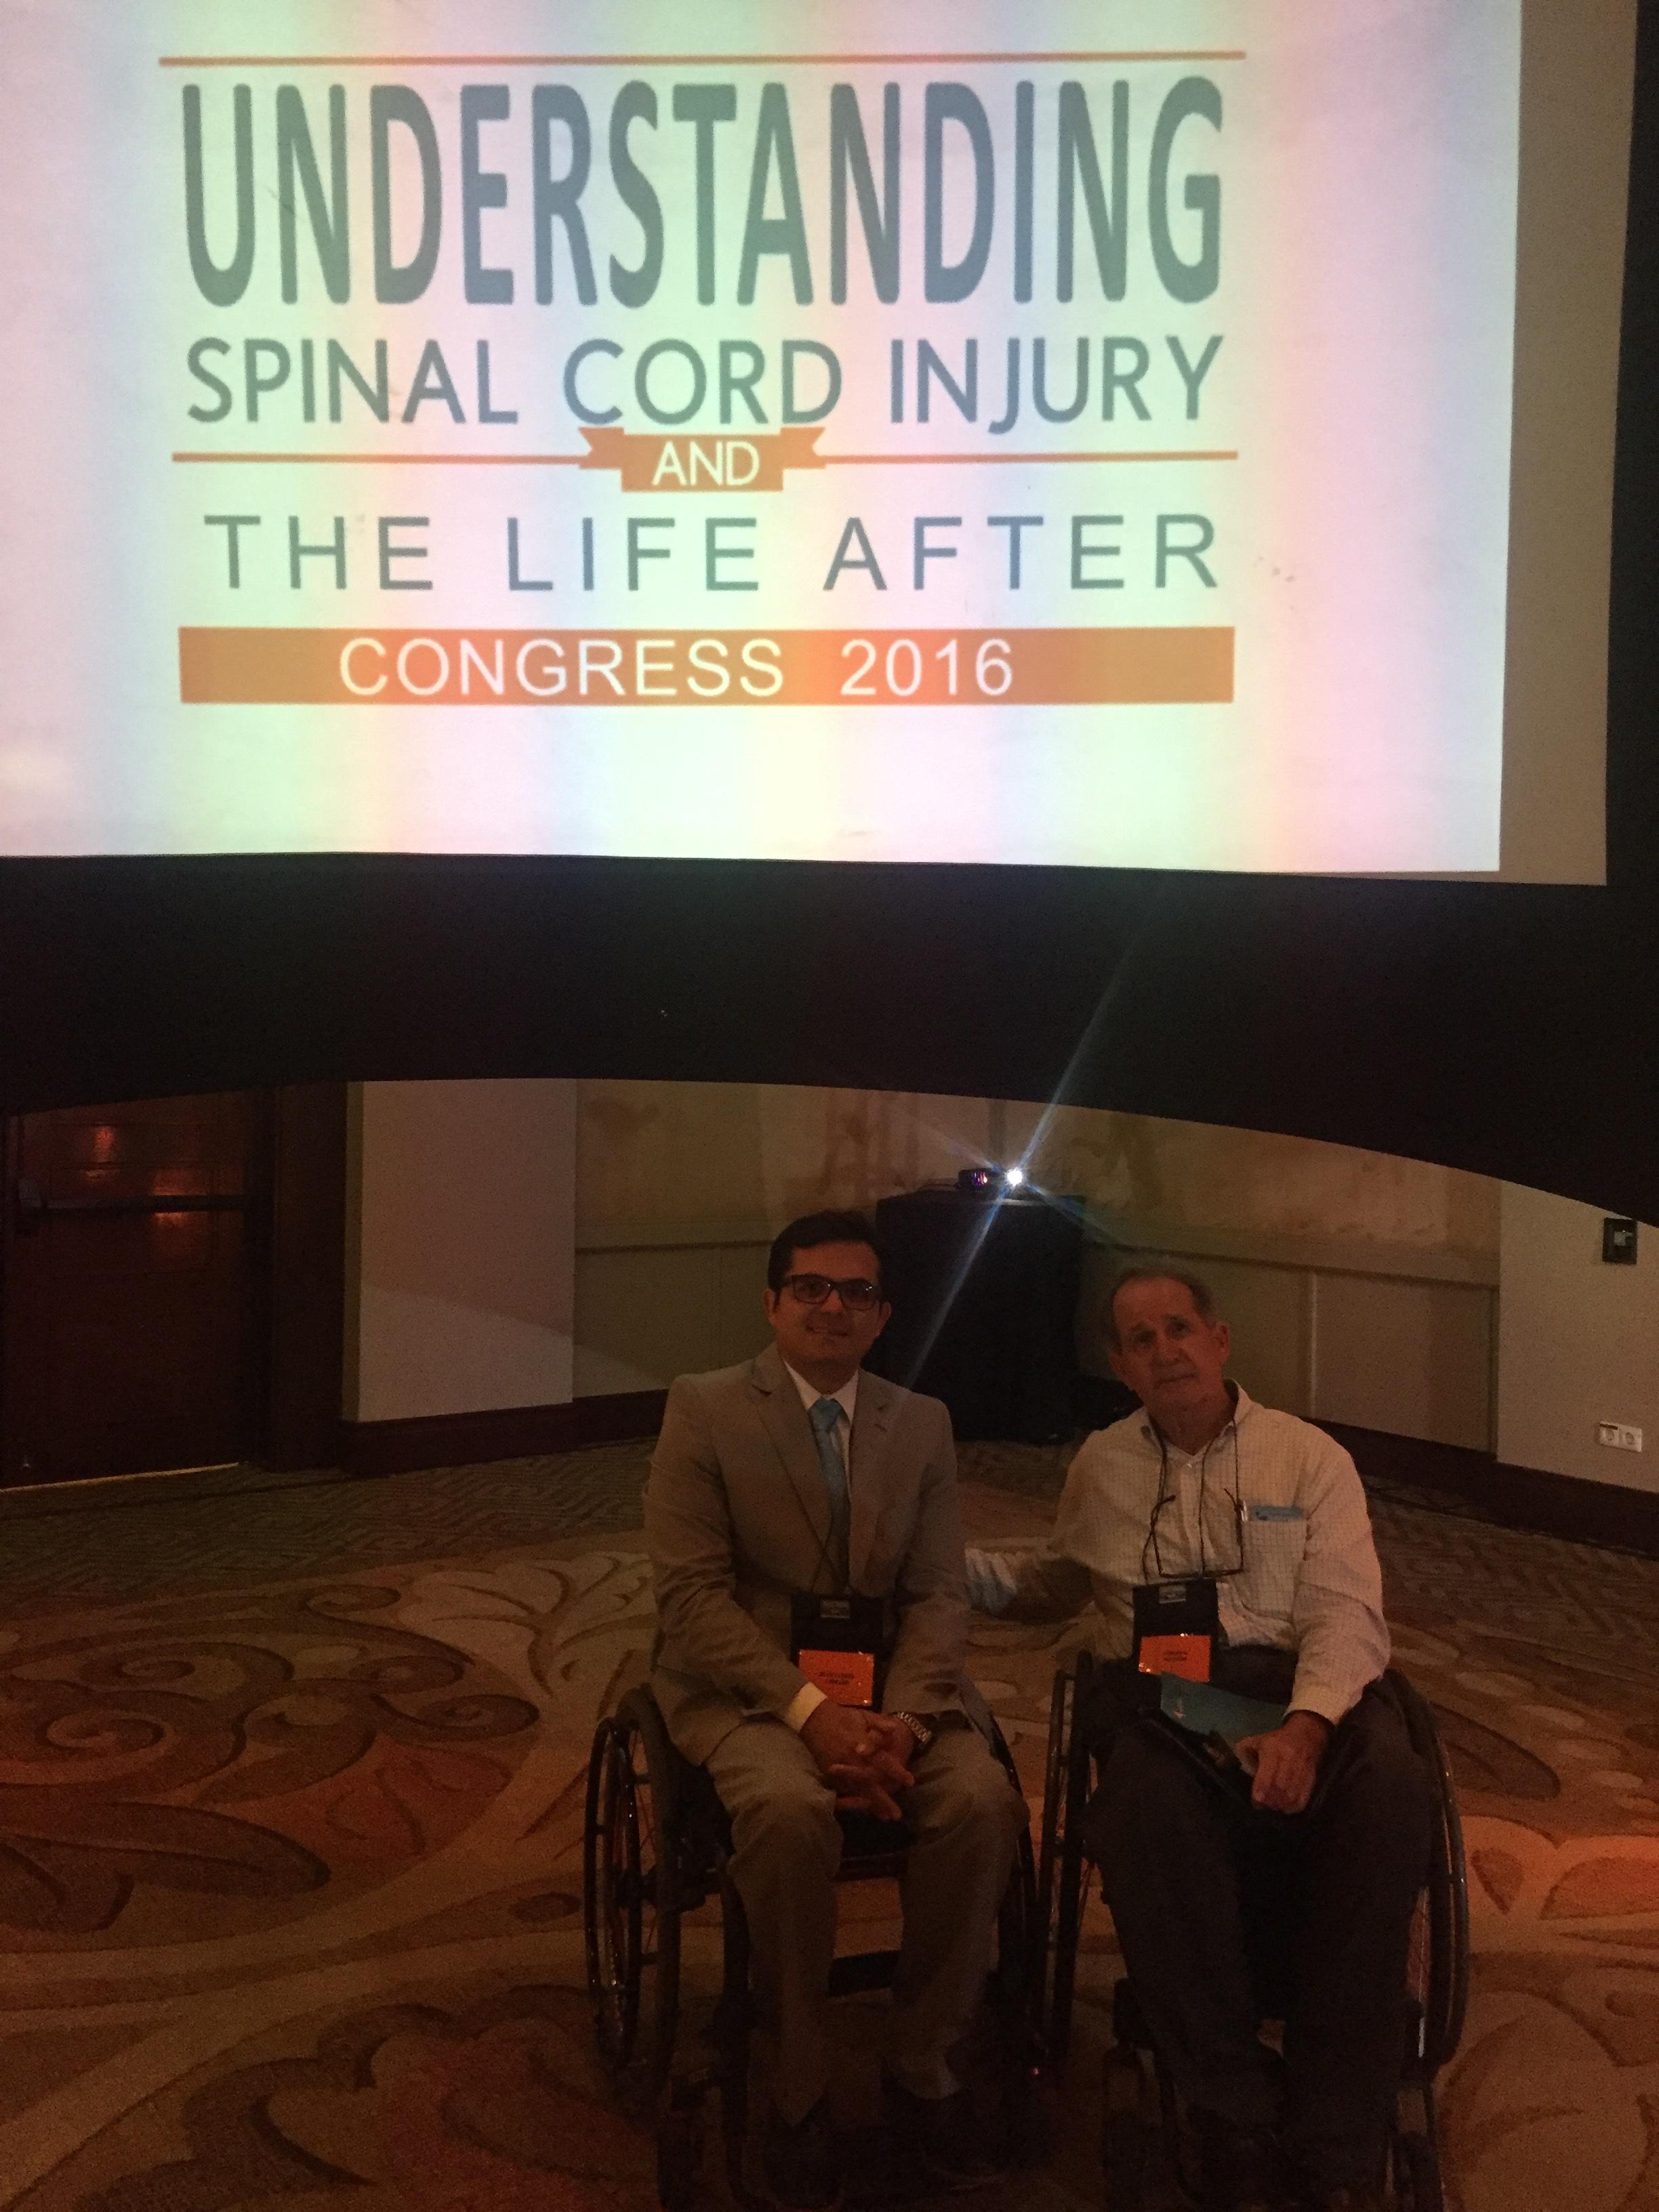 Understanding spinal cord injury congress 2016.